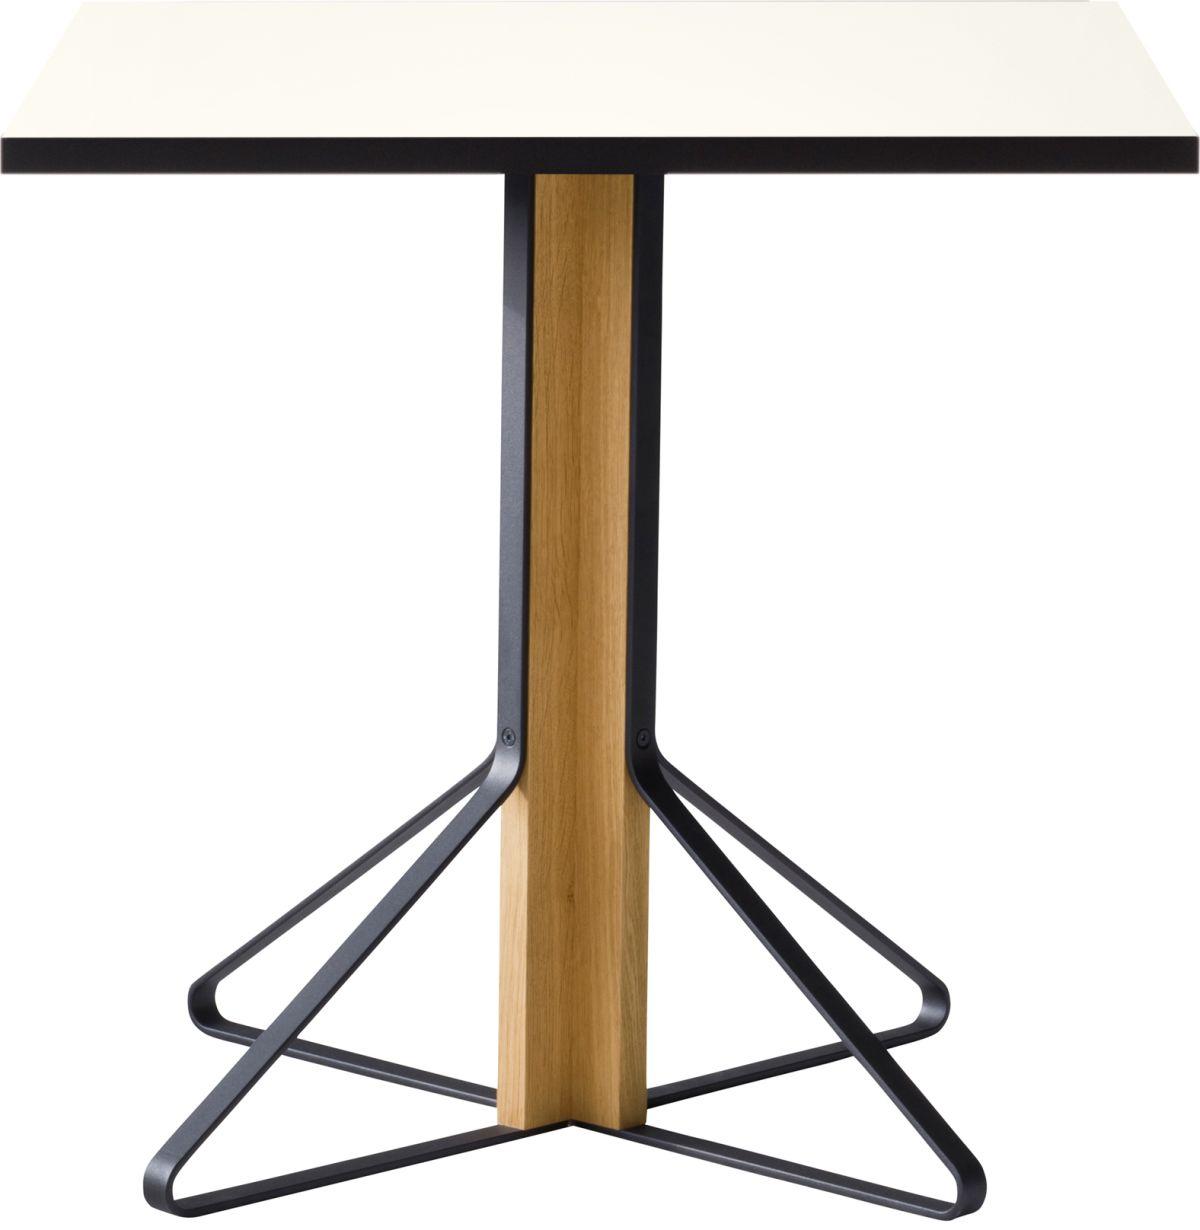 Kaari_Table_Square_Legs-Natural-Oak_Top-White-Hpl_Cut_Out_Srgb-2430515